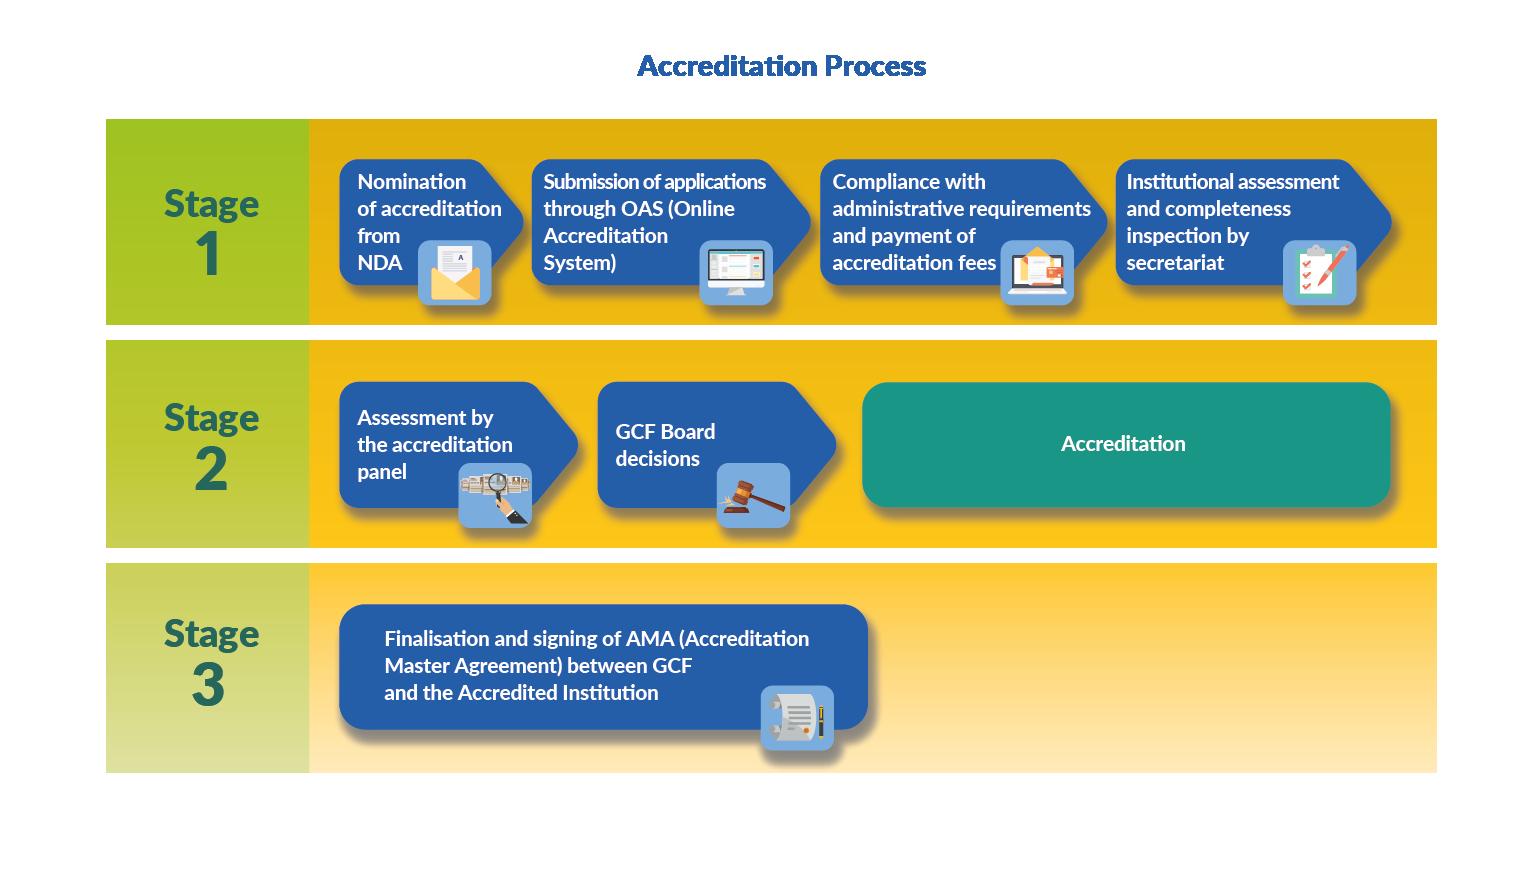 Nda Gcf Accreditation Process Performance appraisal, assessment centers, organizational objectives, individual. nda gcf accreditation process